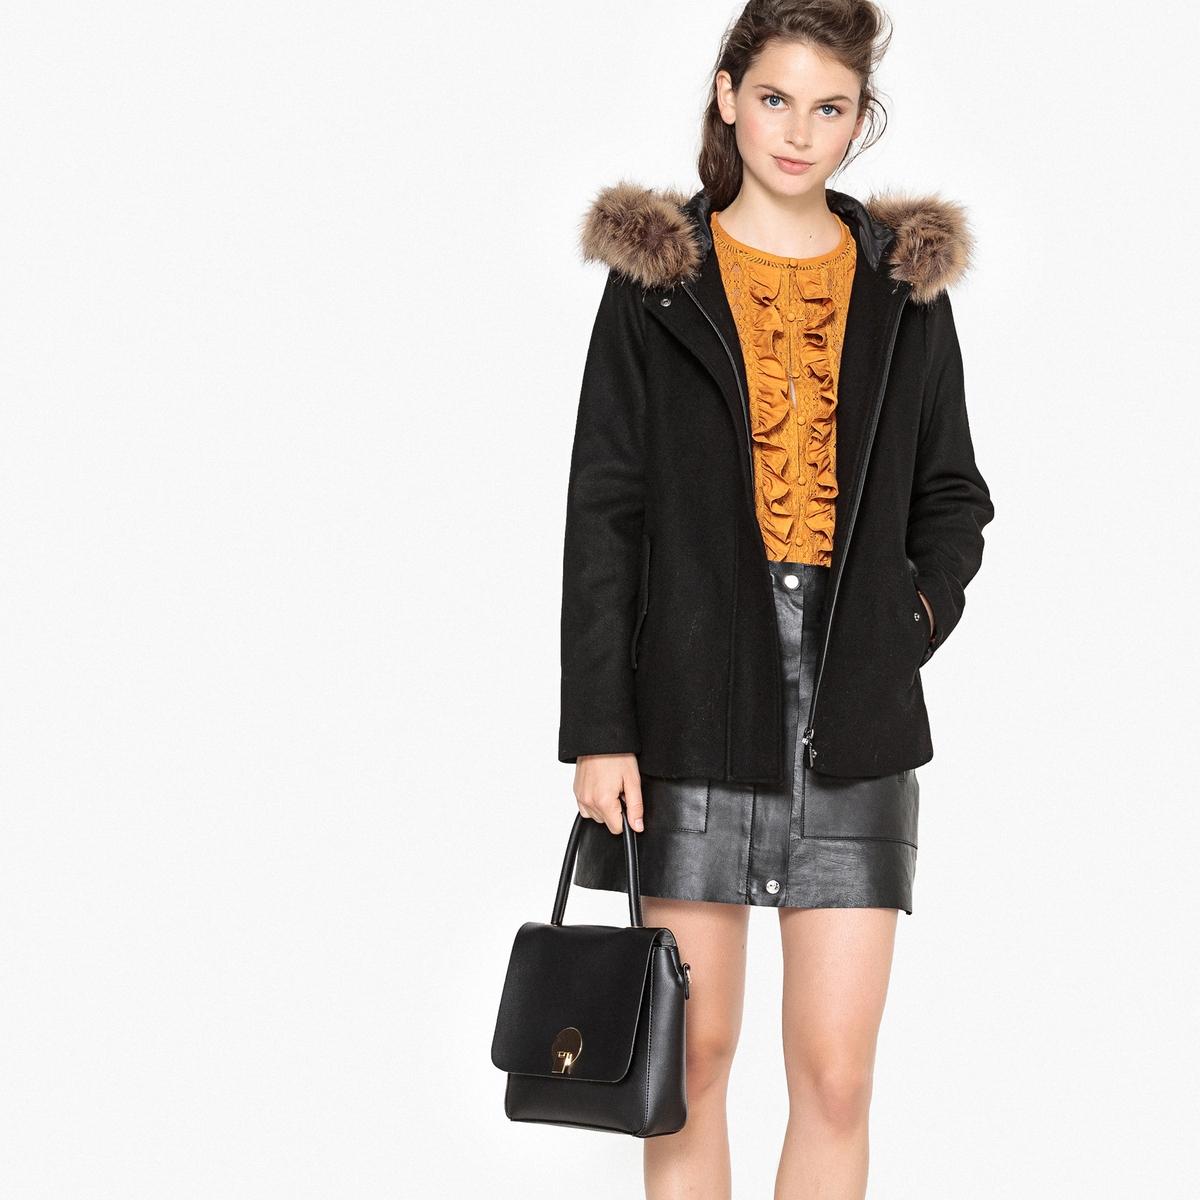 Abrigo corto con capucha de lana mezclada